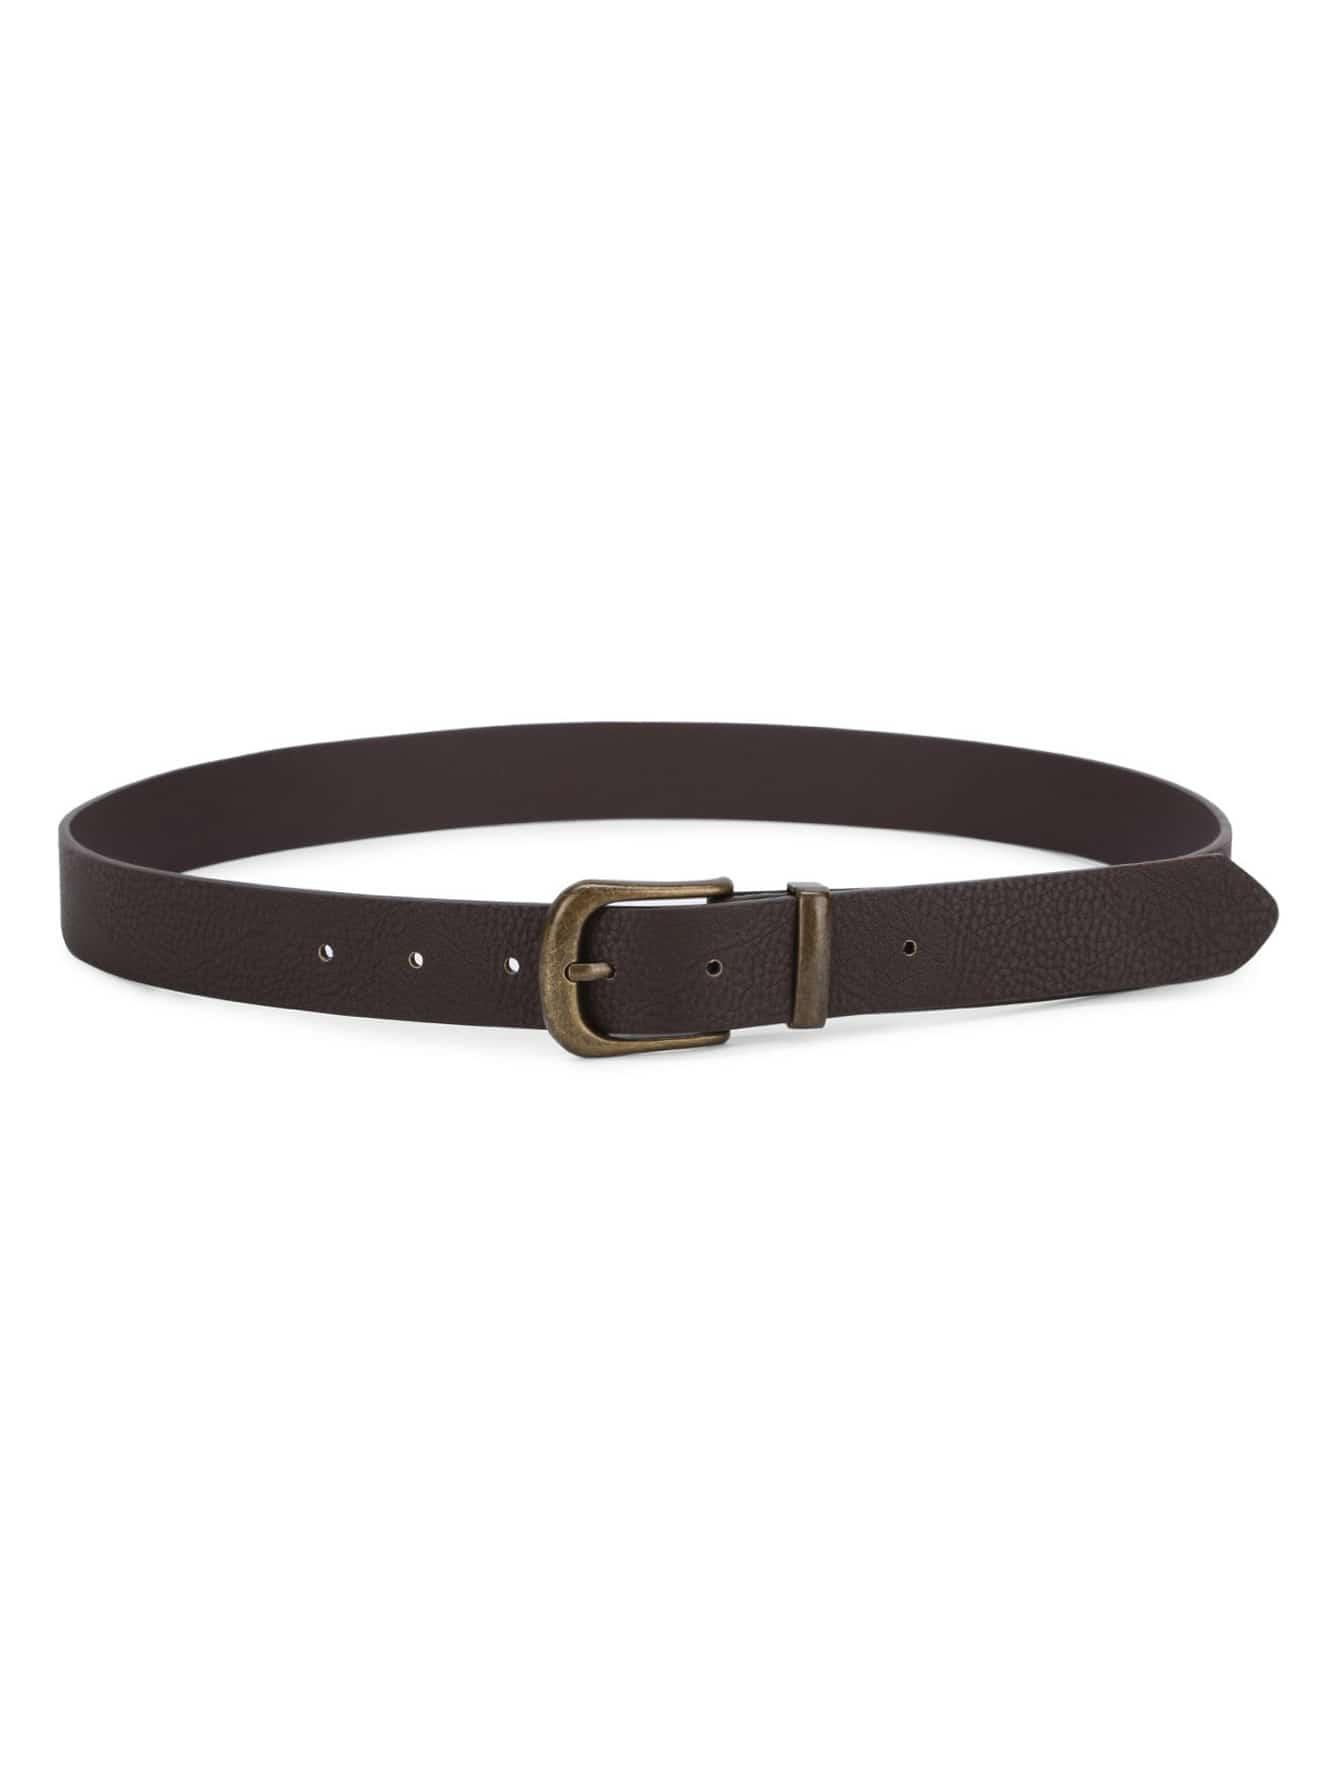 Metal Buckle PU Belt все цены